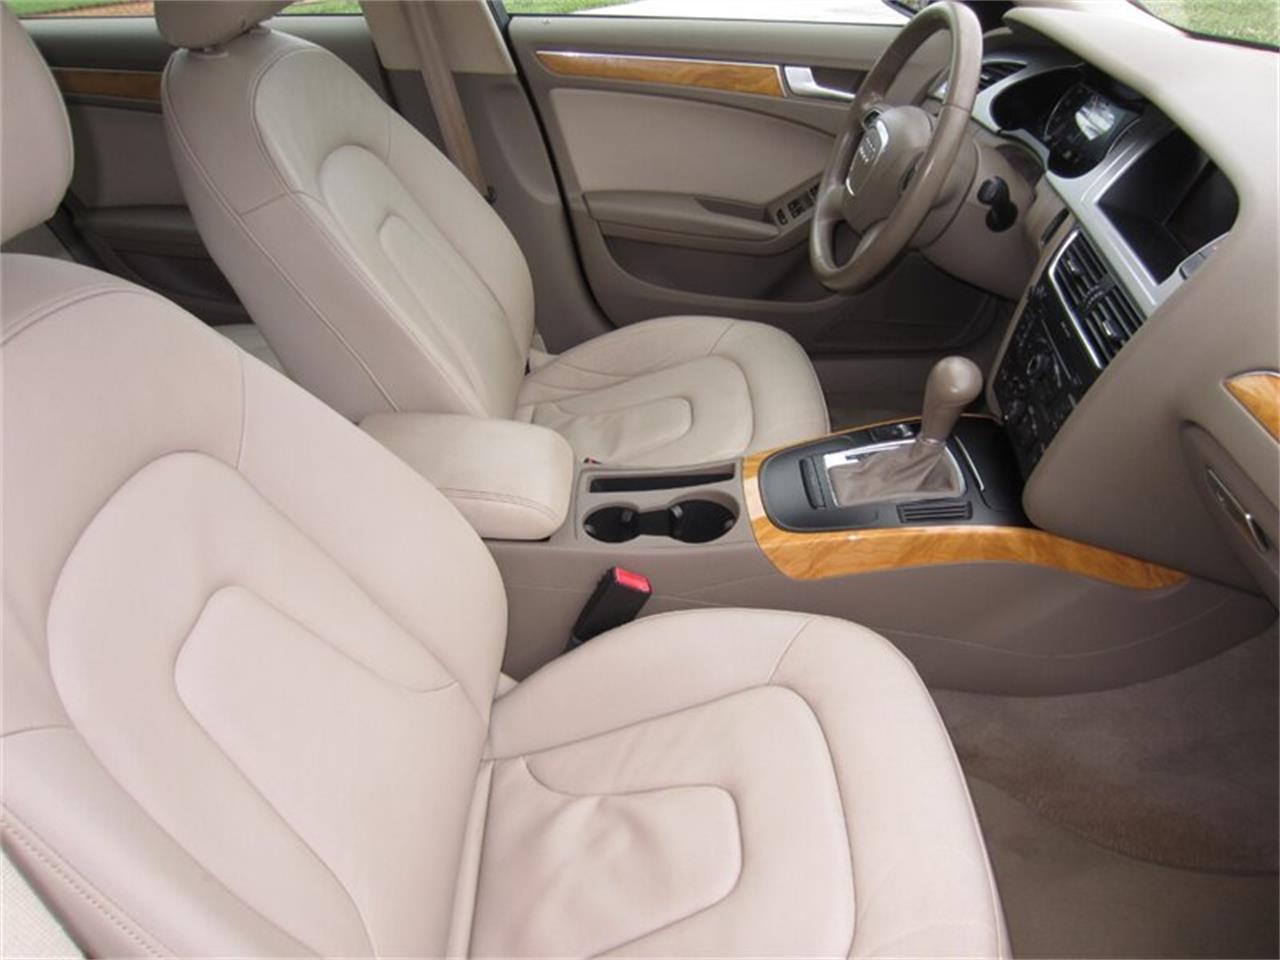 2010 Audi A4 (CC-1308701) for sale in Delray Beach, Florida